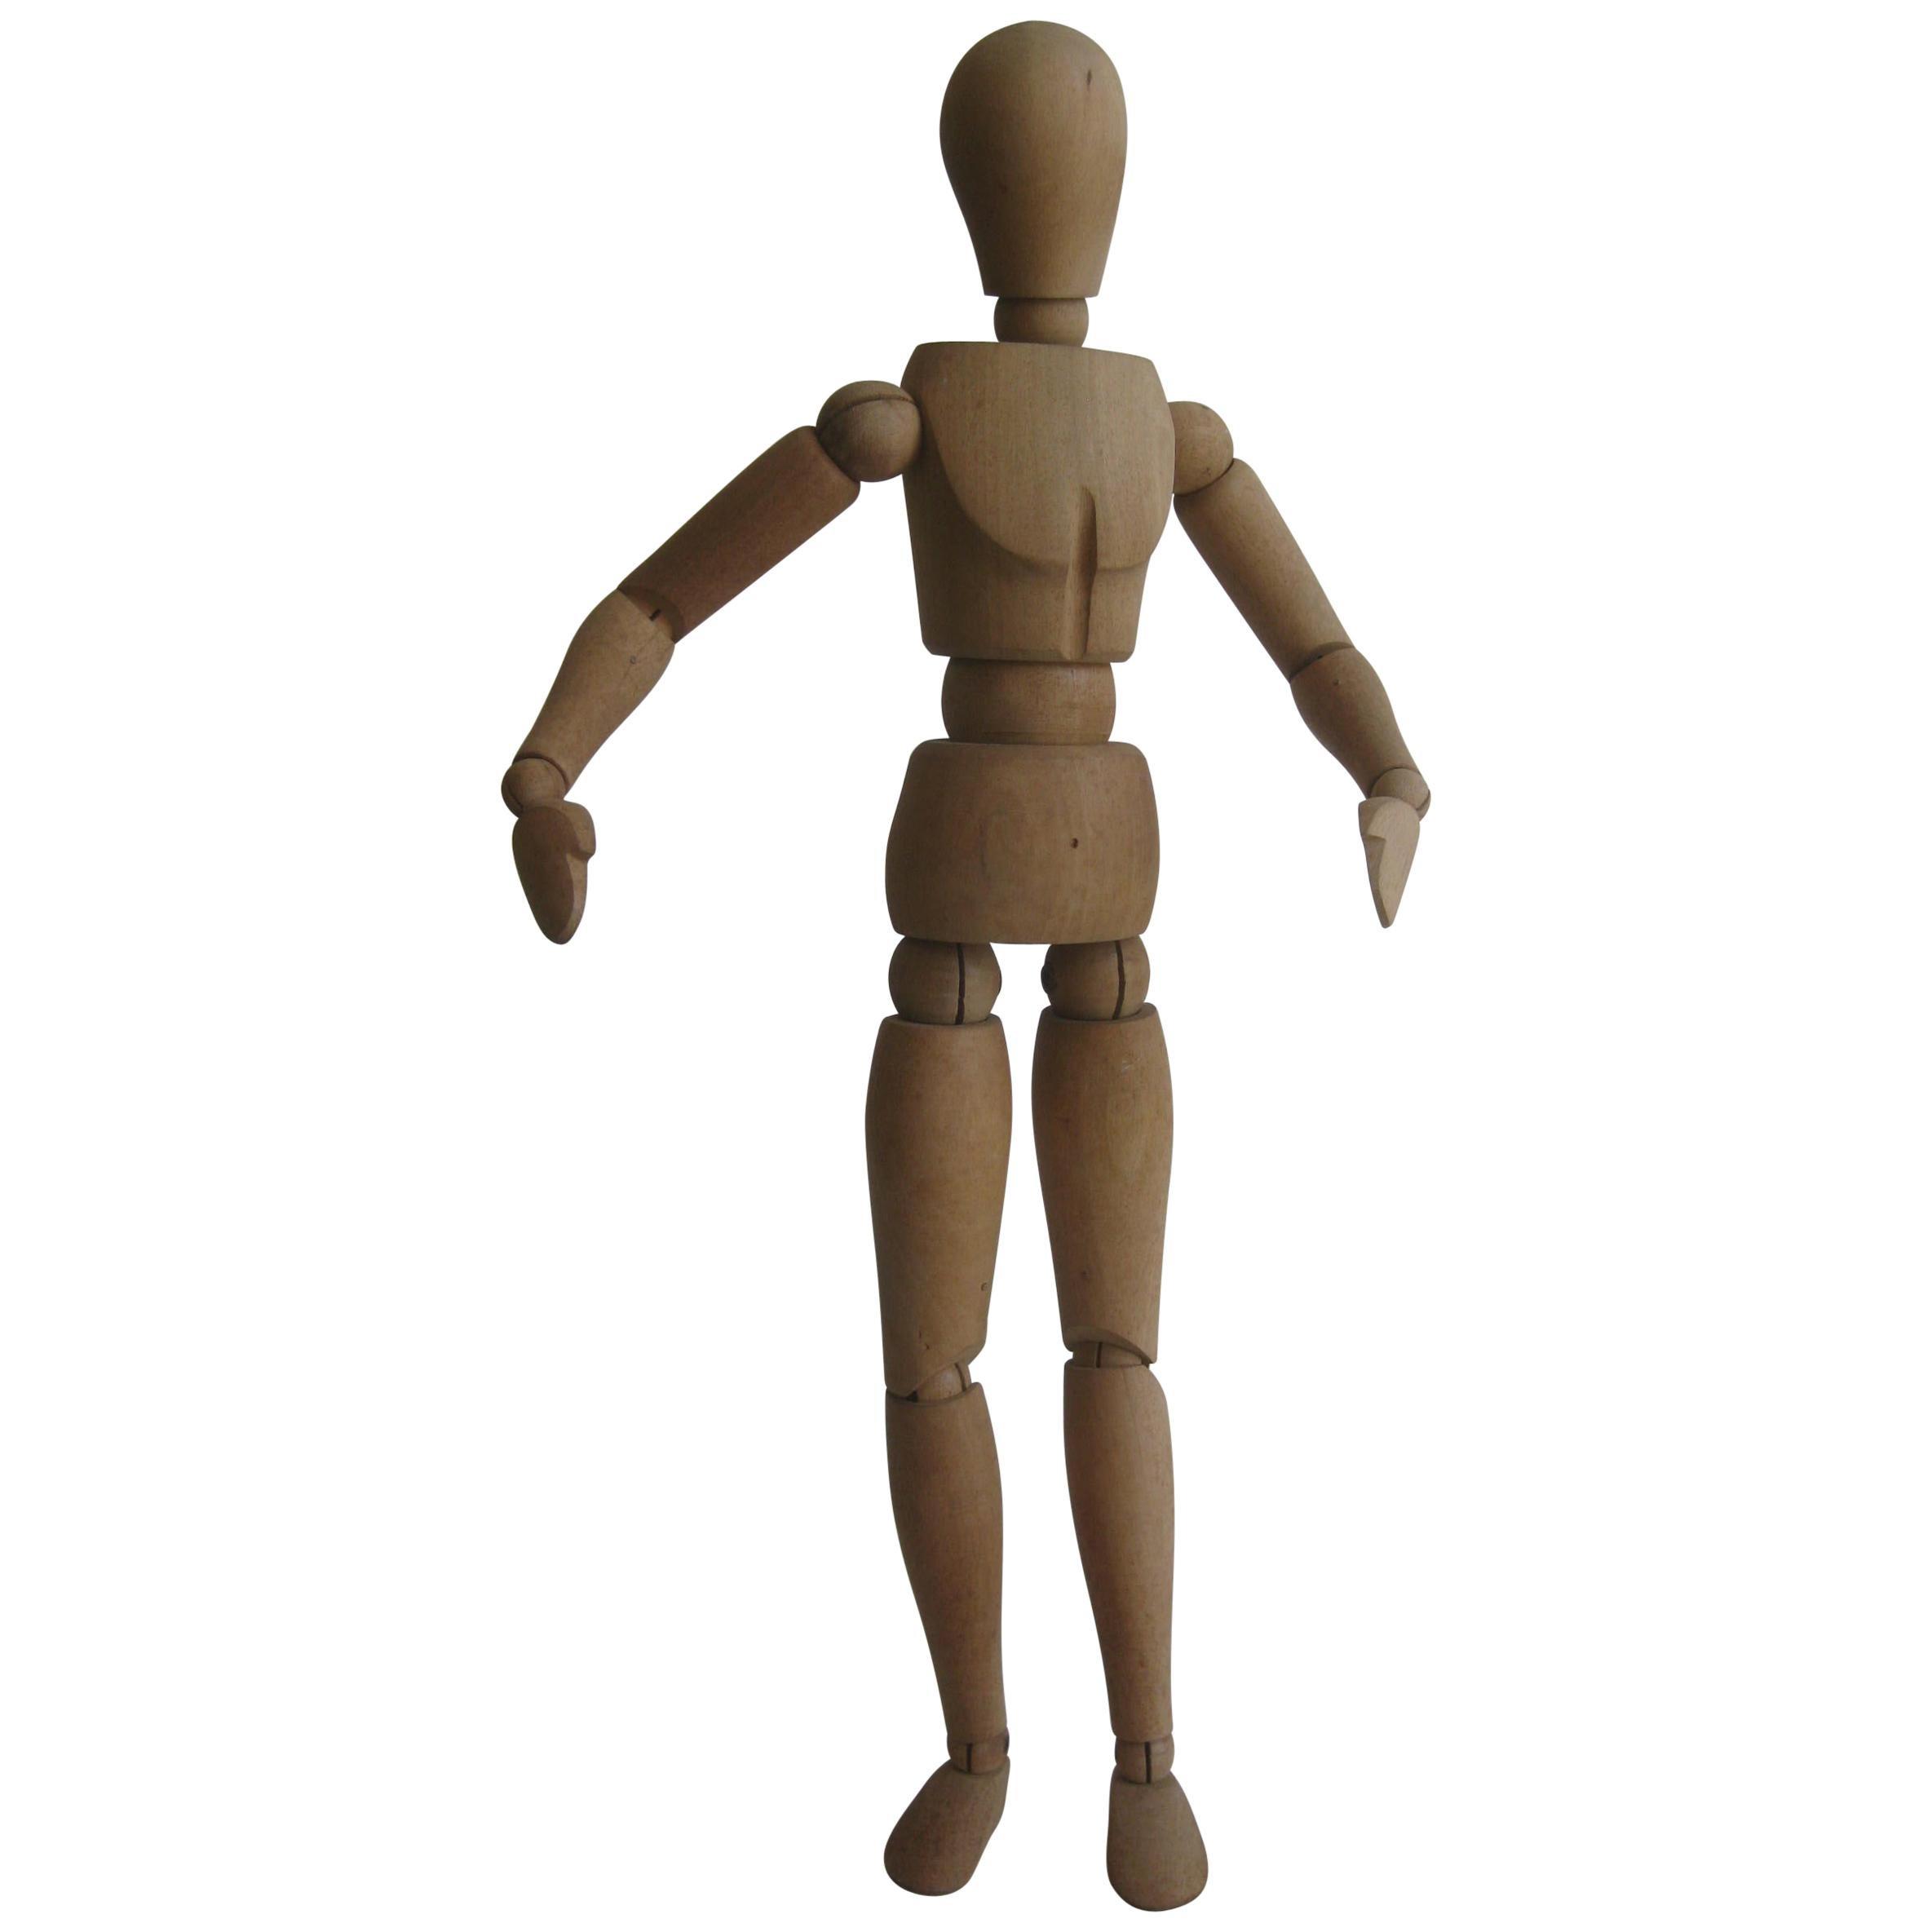 Antique Articulated Wood Nude Artist Figural Model Sculpture Statue